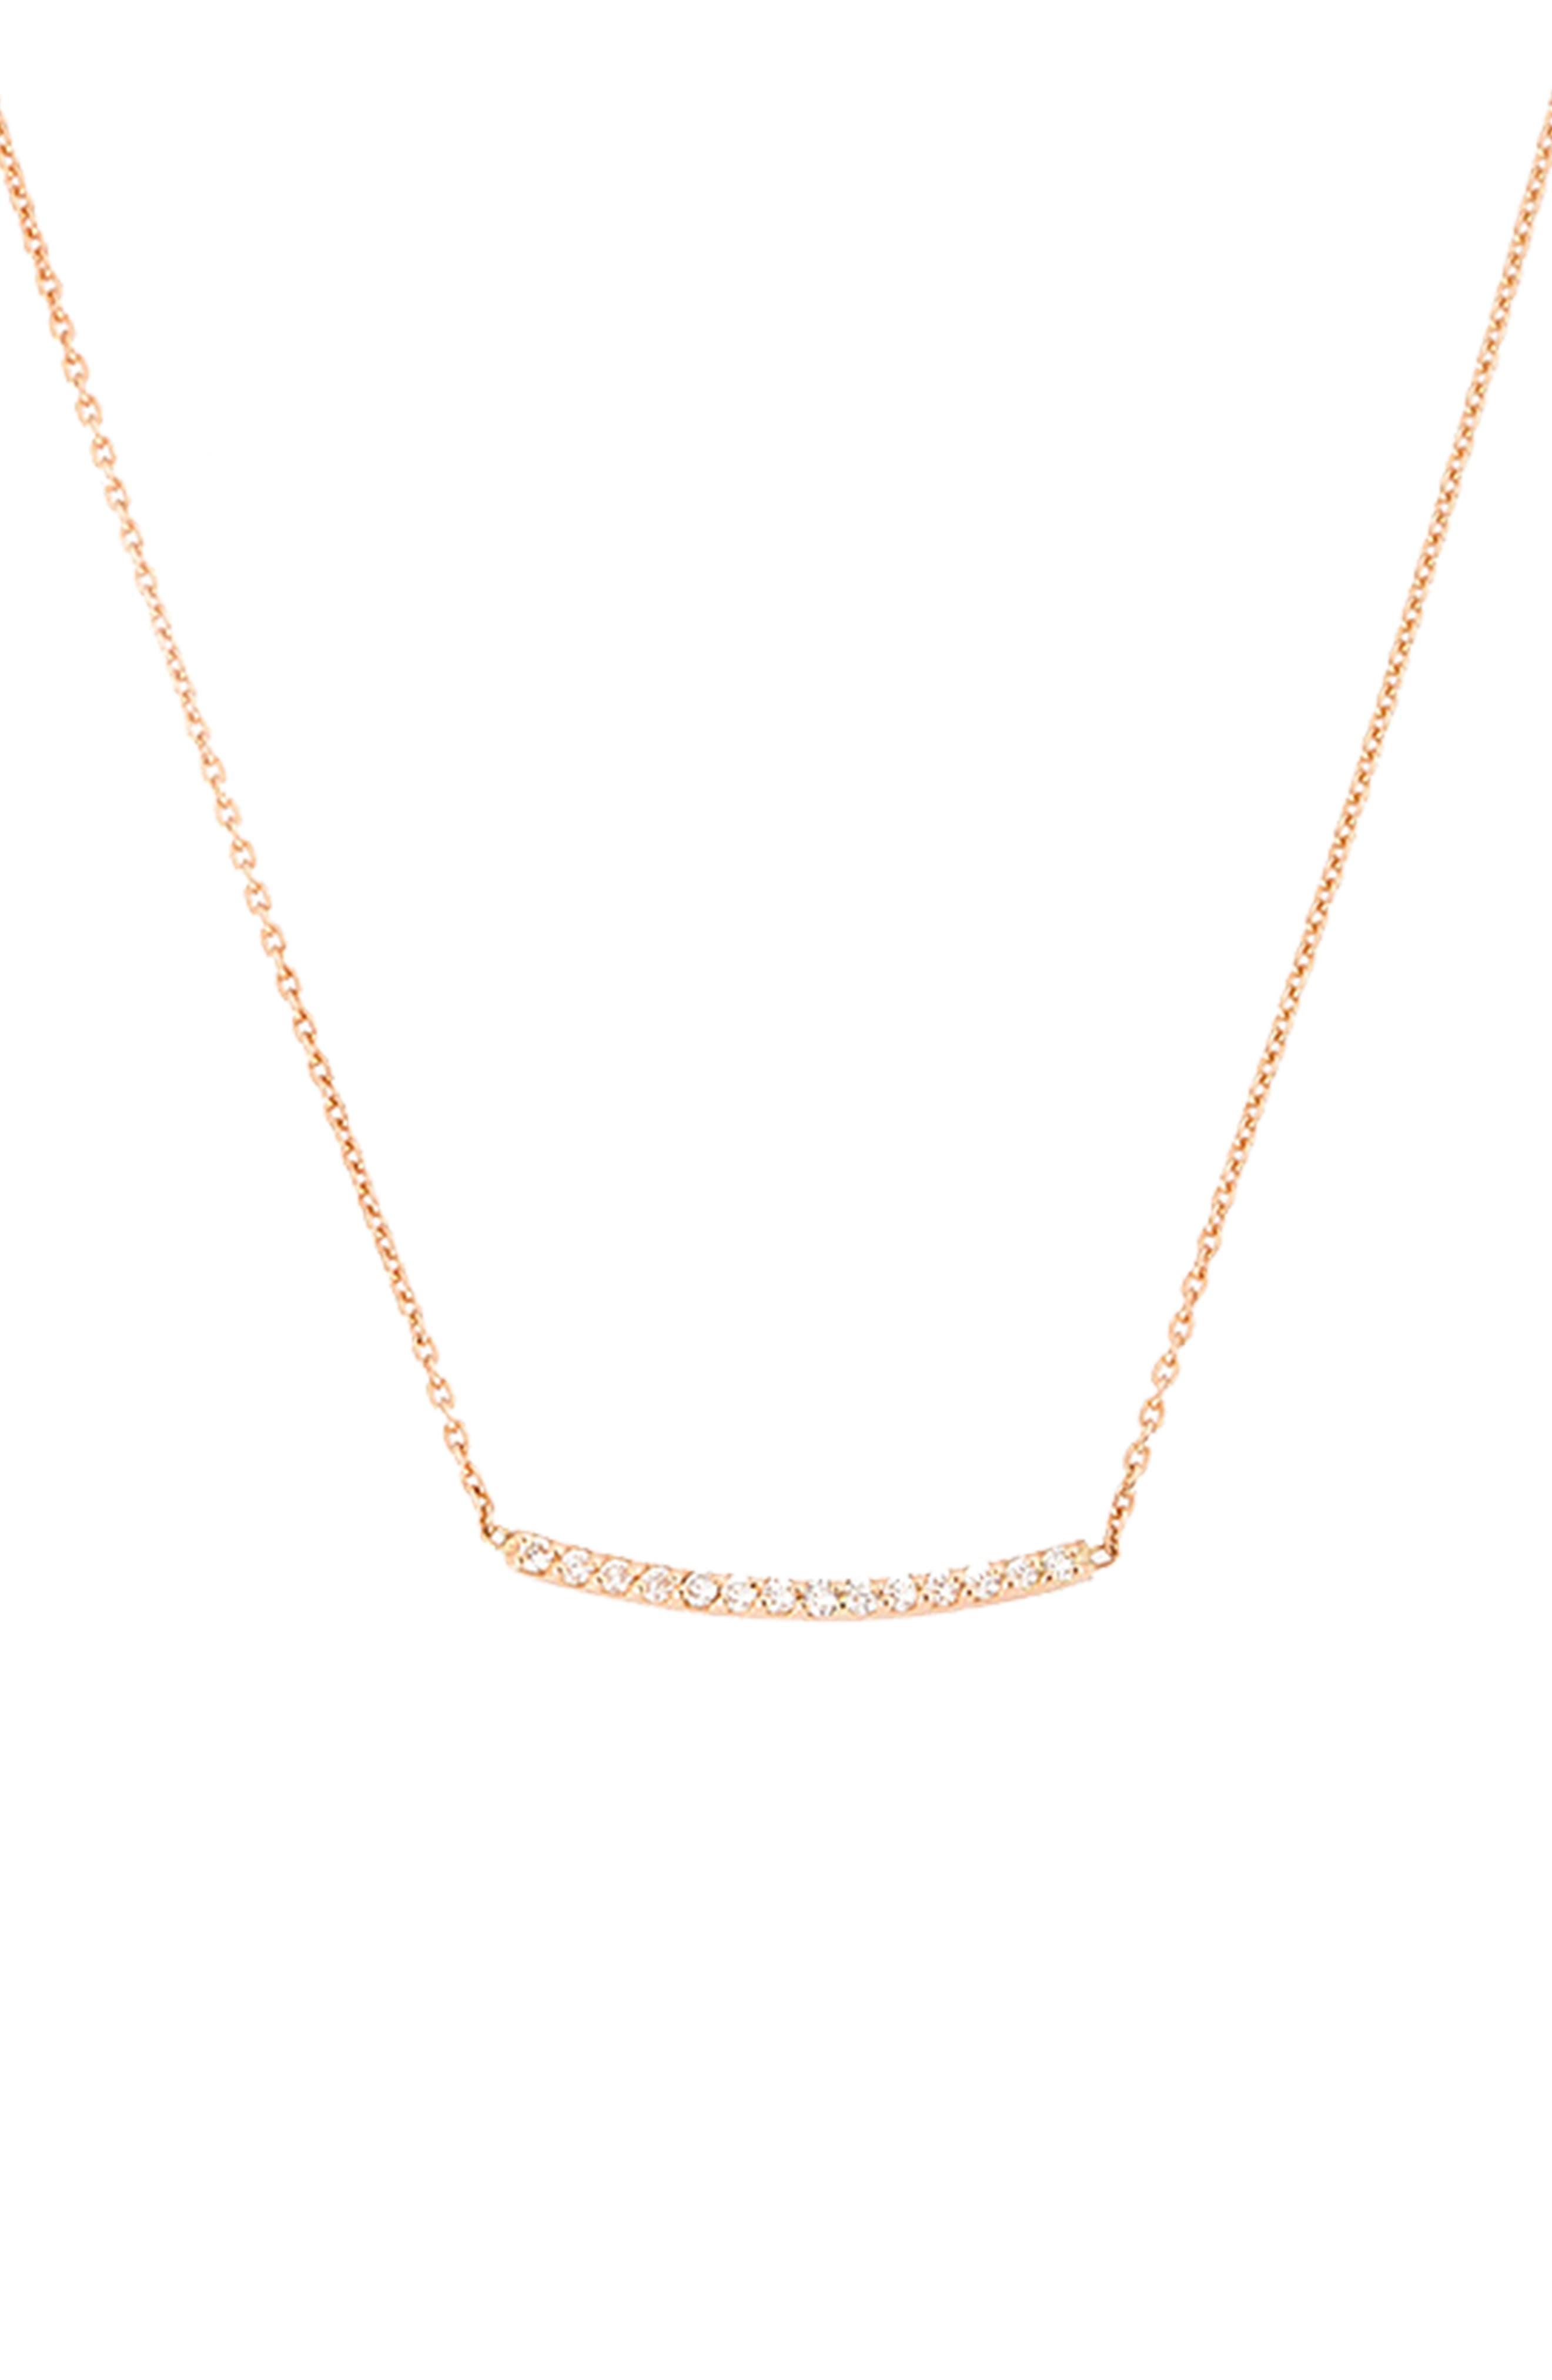 Lumiere Diamond Bar Necklace,                         Main,                         color, Rose Gold